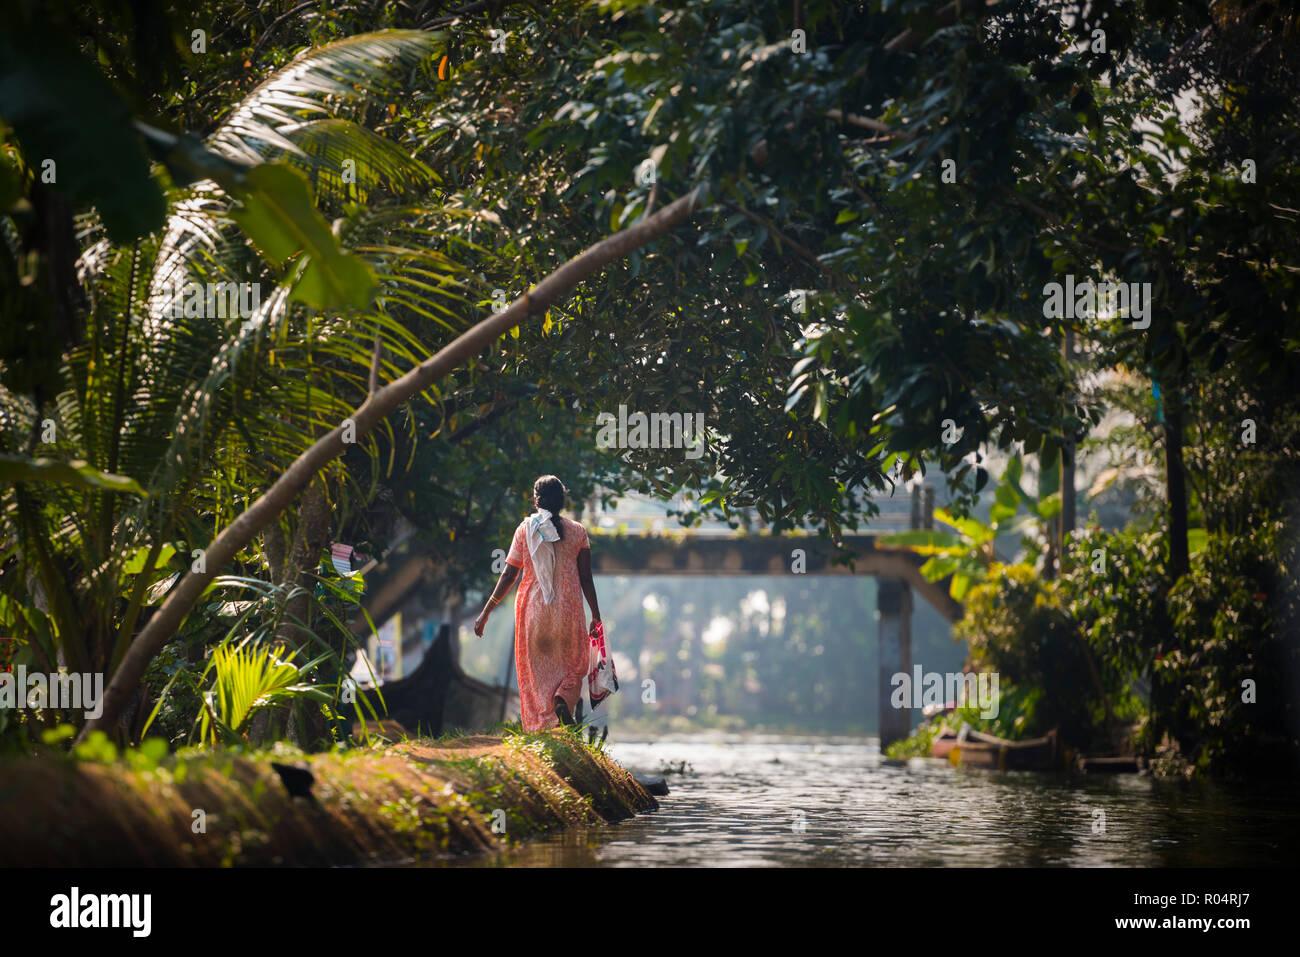 Backwaters vicino a Cochin (Alappuzha), Kerala, India, Asia Immagini Stock